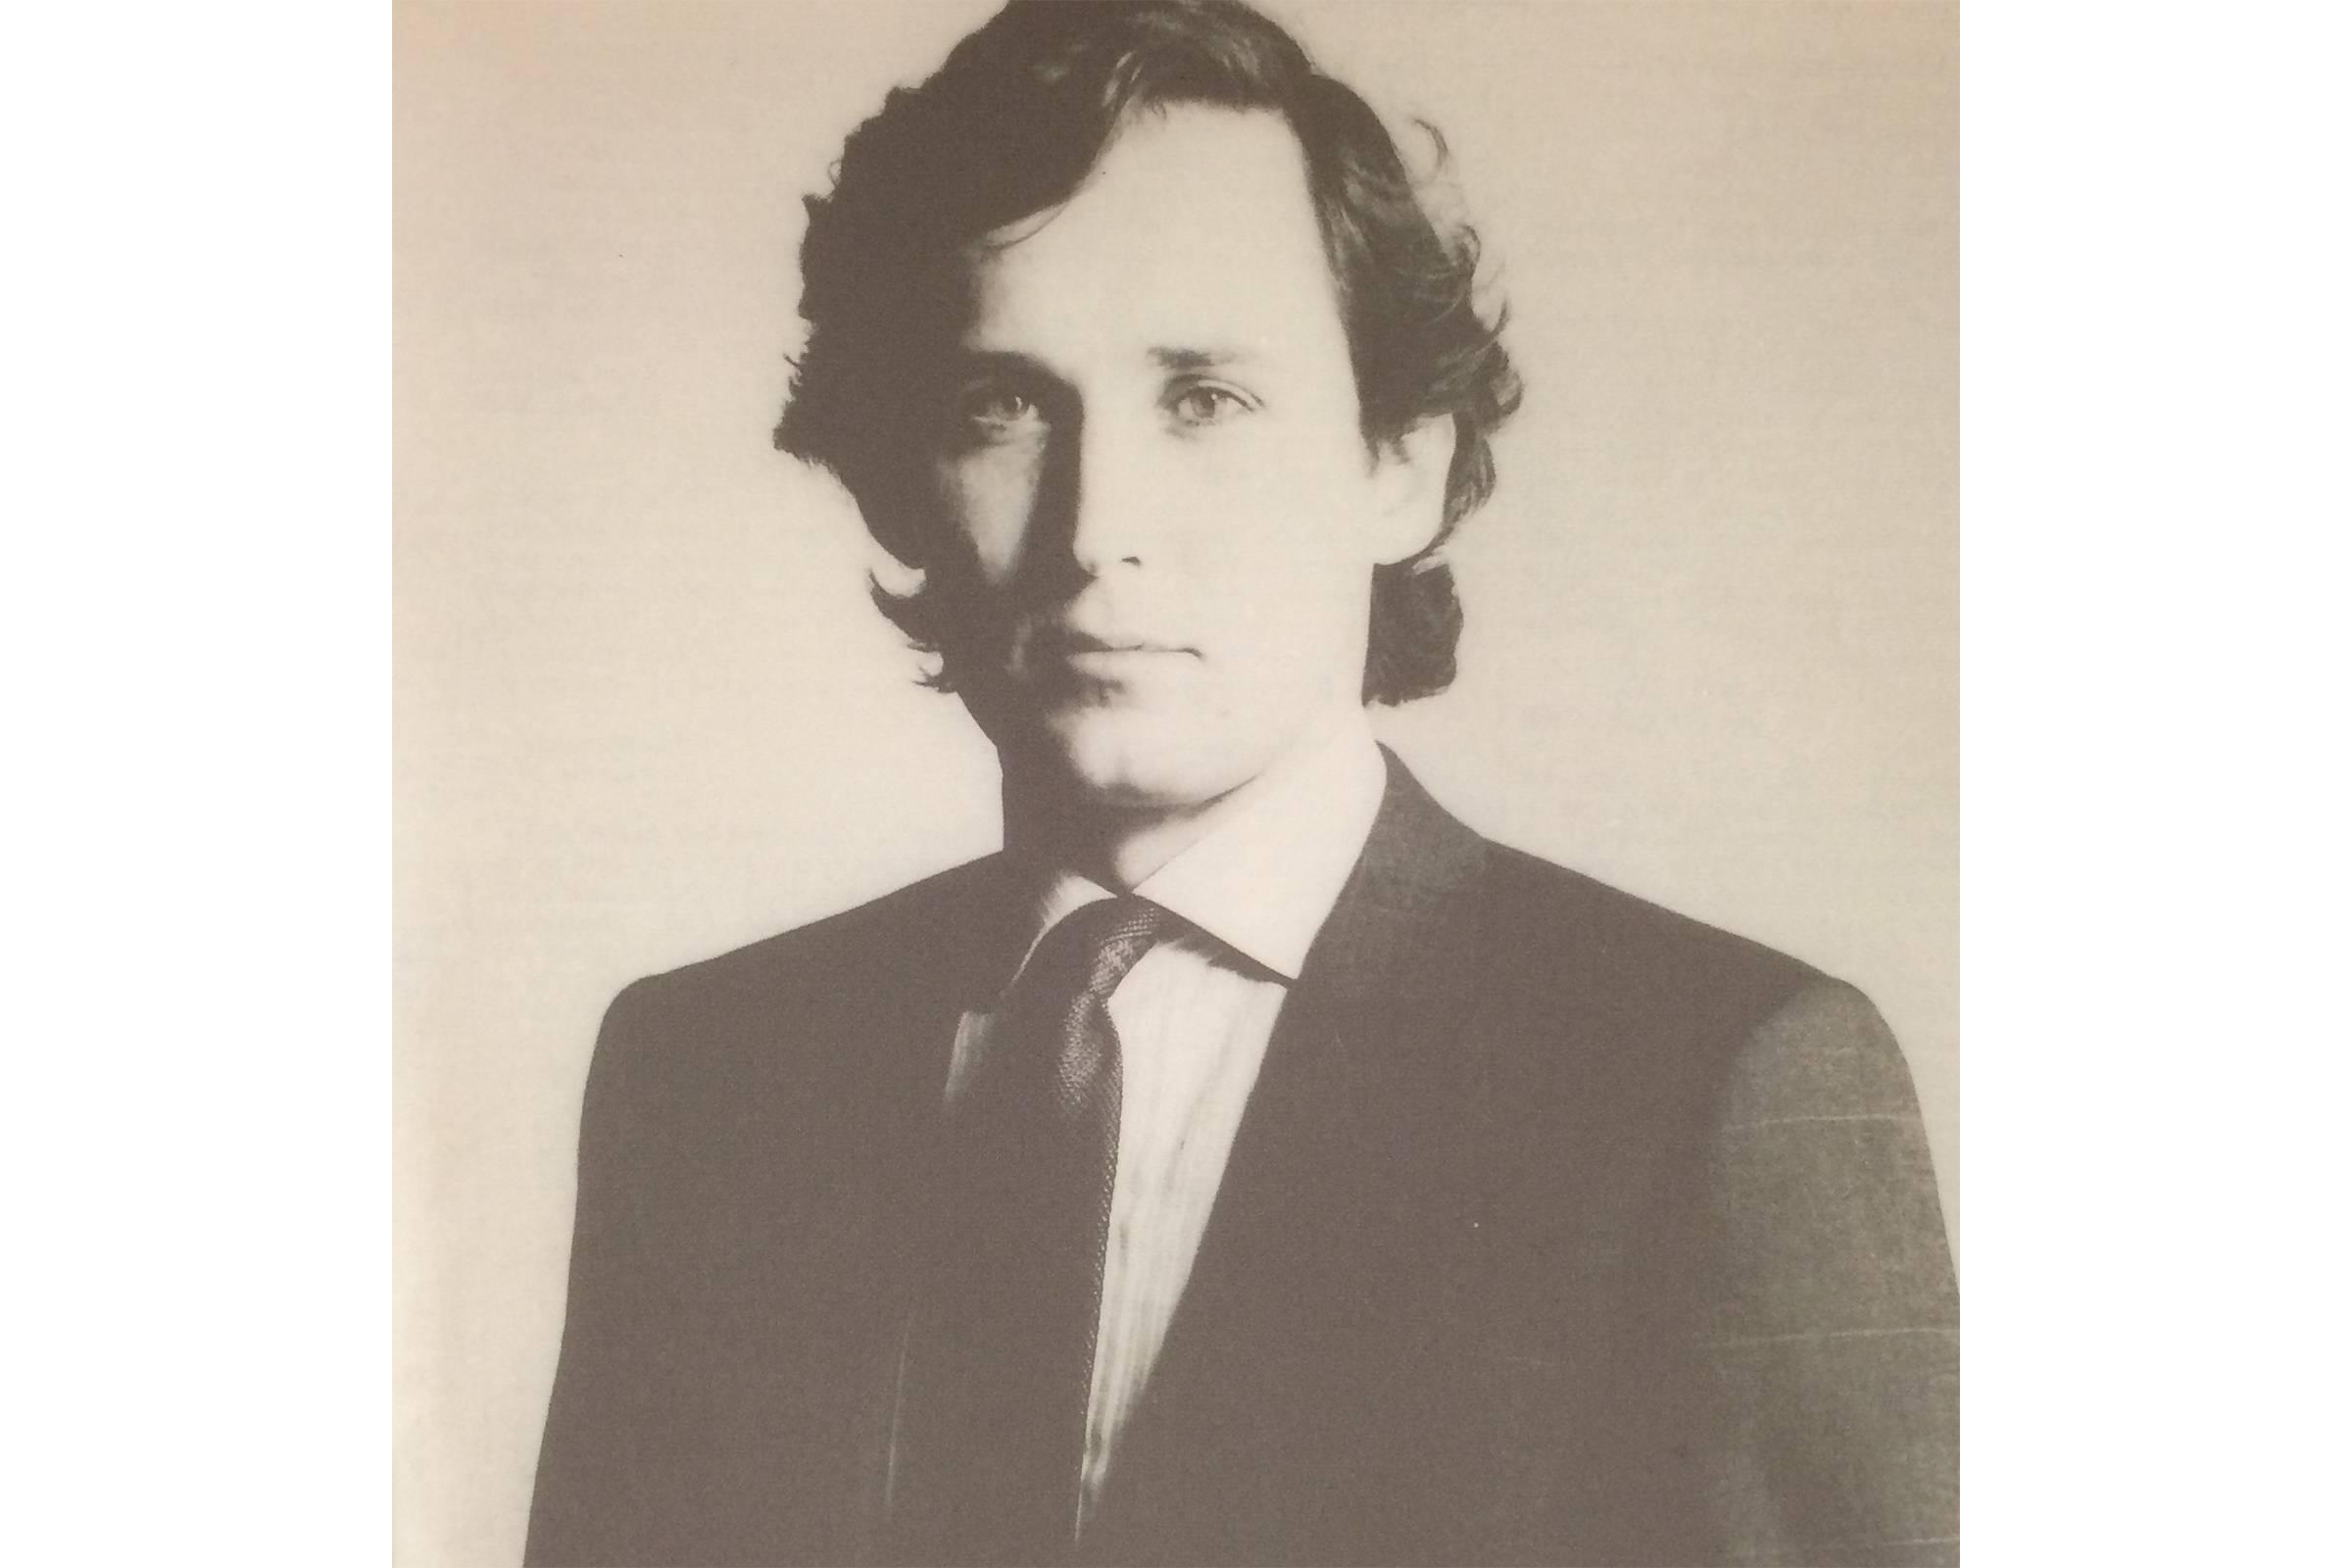 Founder Ermenegildo Zegna (c. 1920)